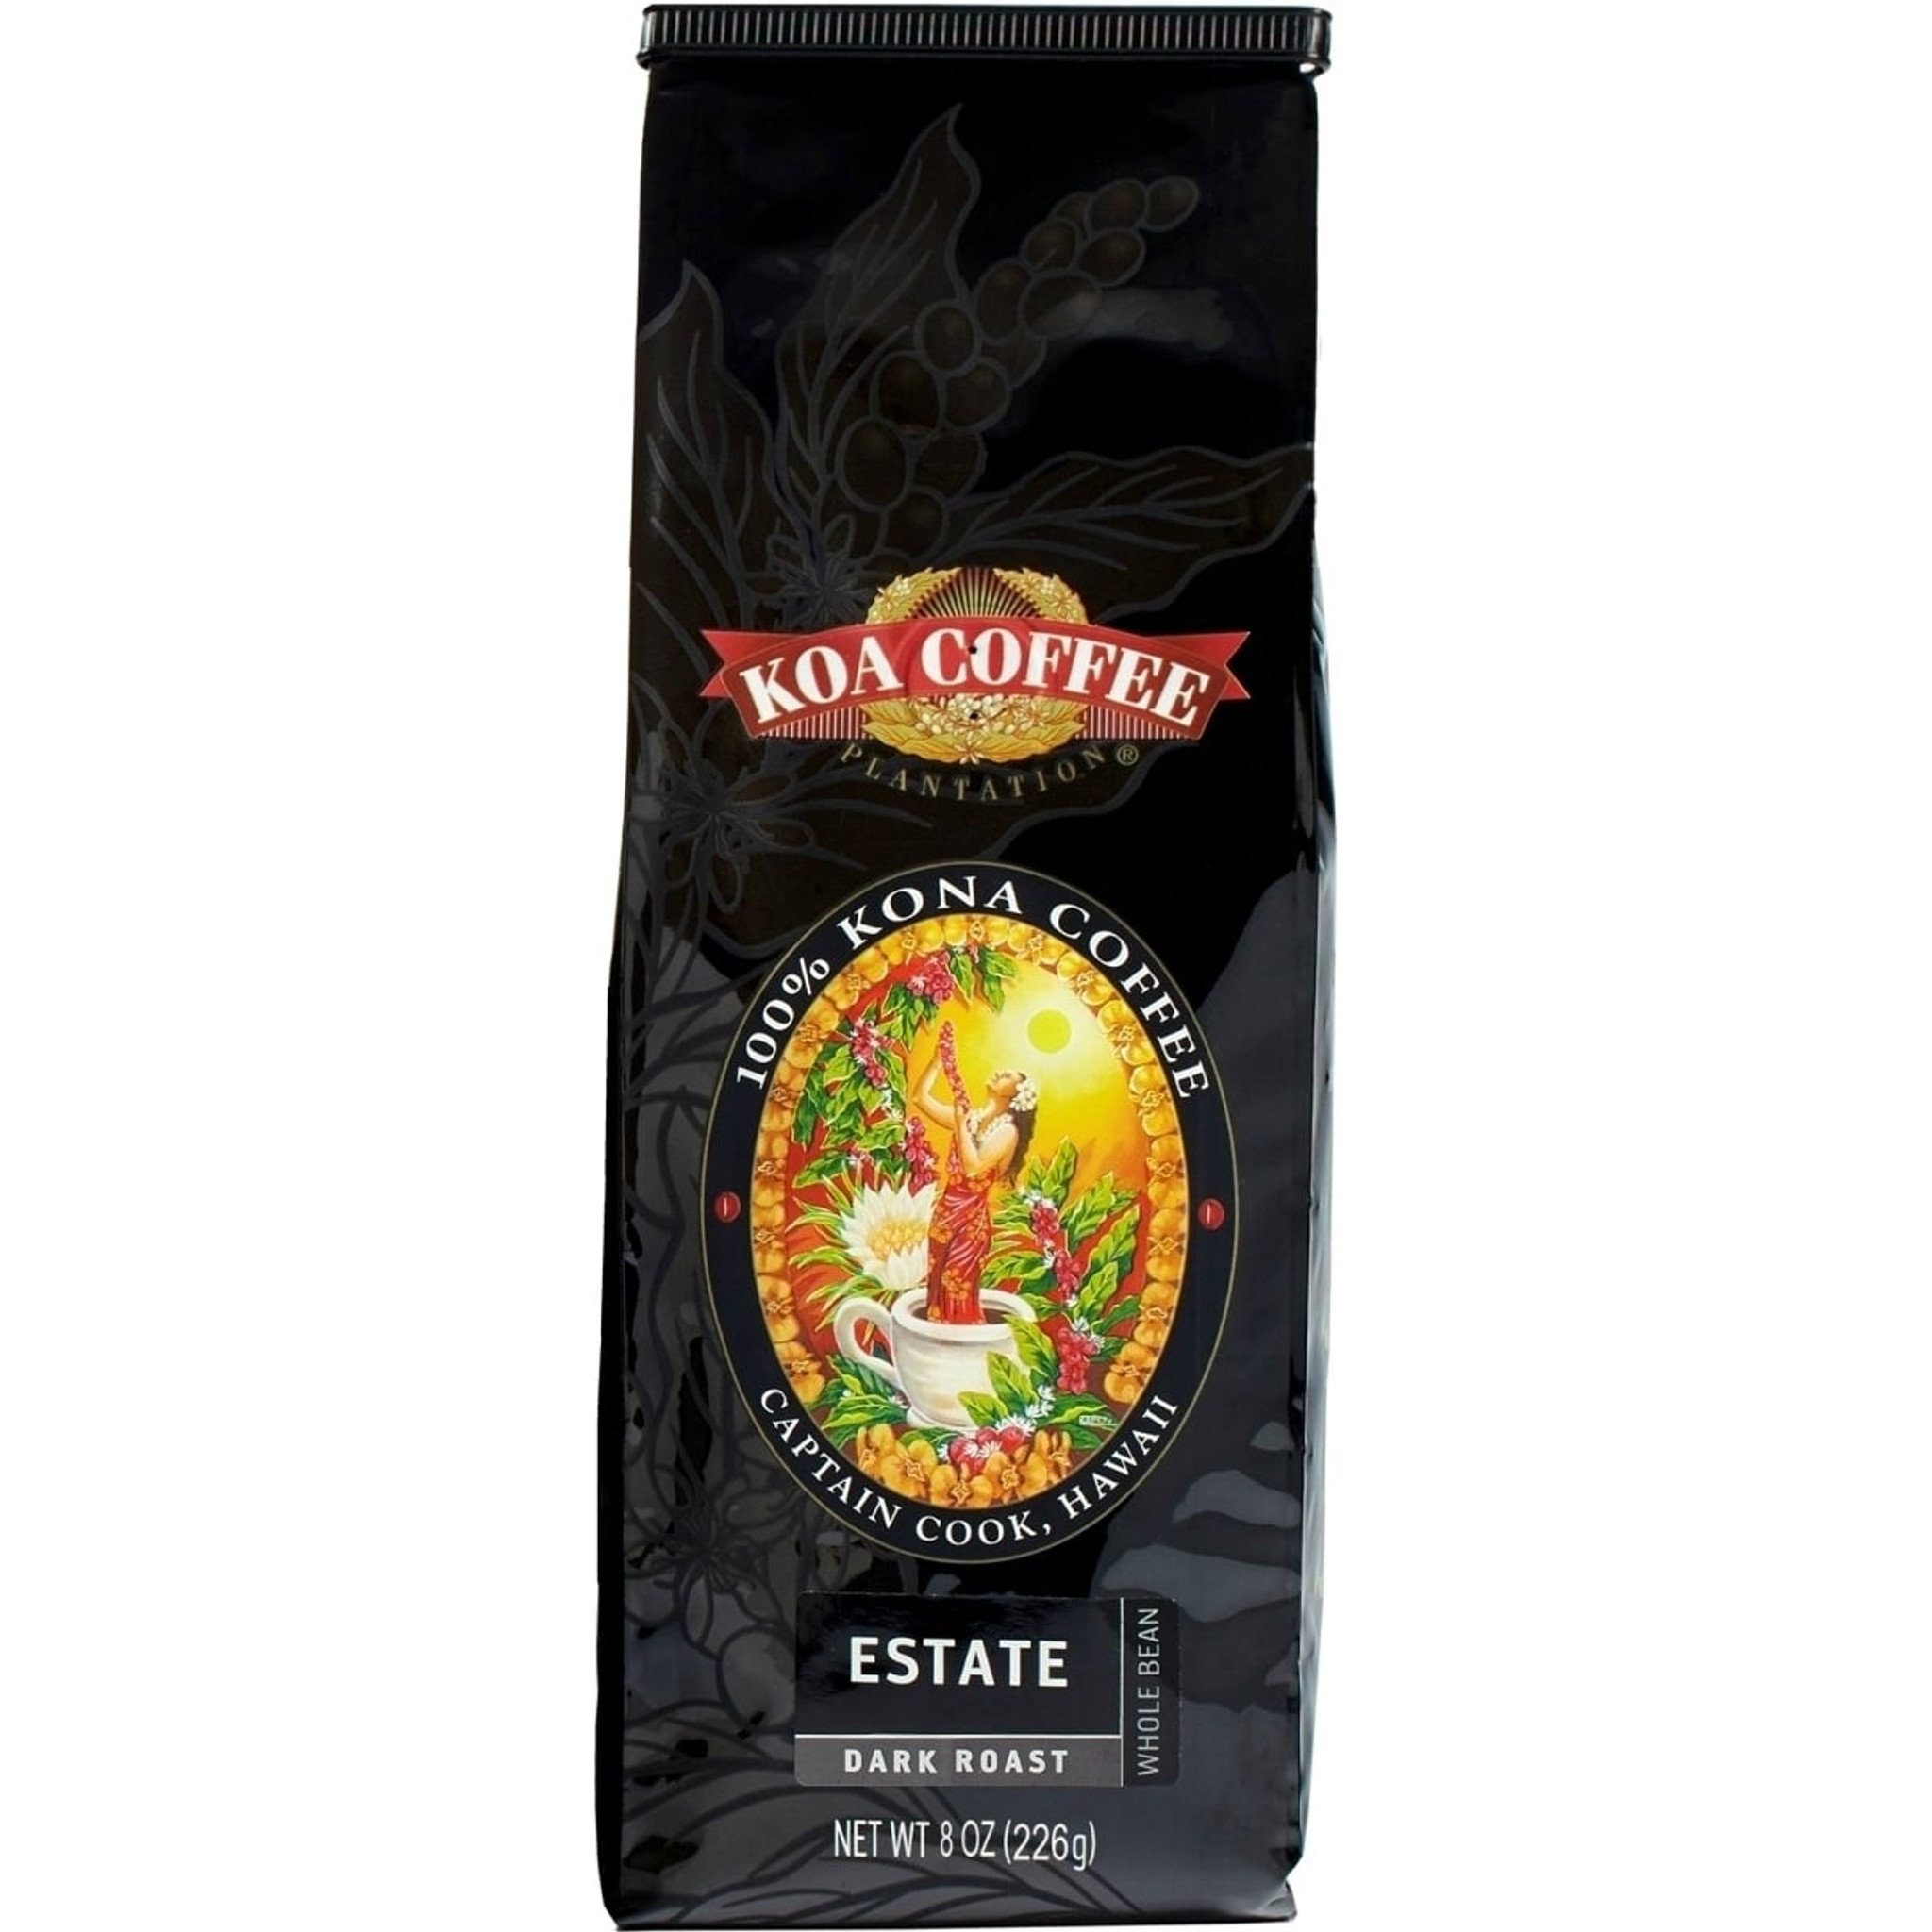 Koa Coffee Estate Dark Roast 100% Kona Coffee